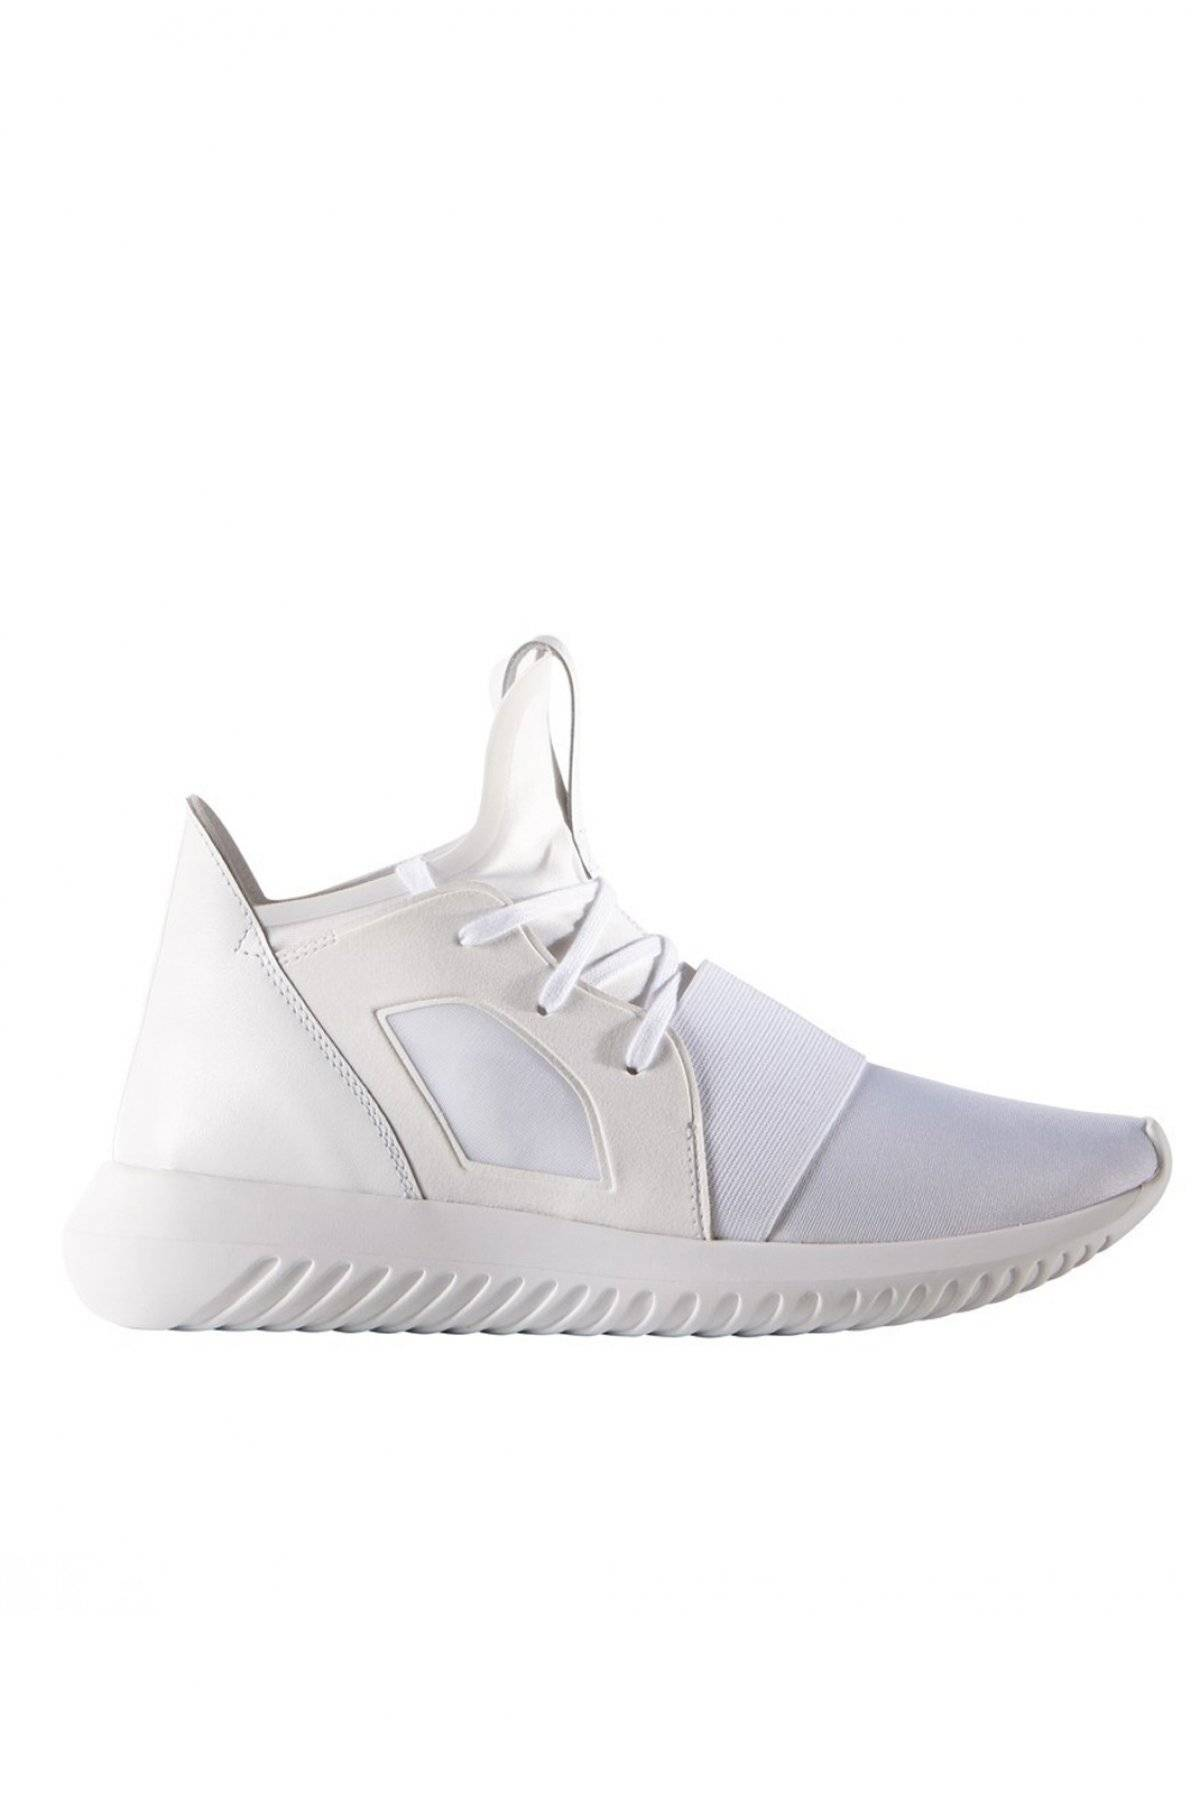 Adidas Sneakers S75250 Tubular Defiant W  -  Adidas